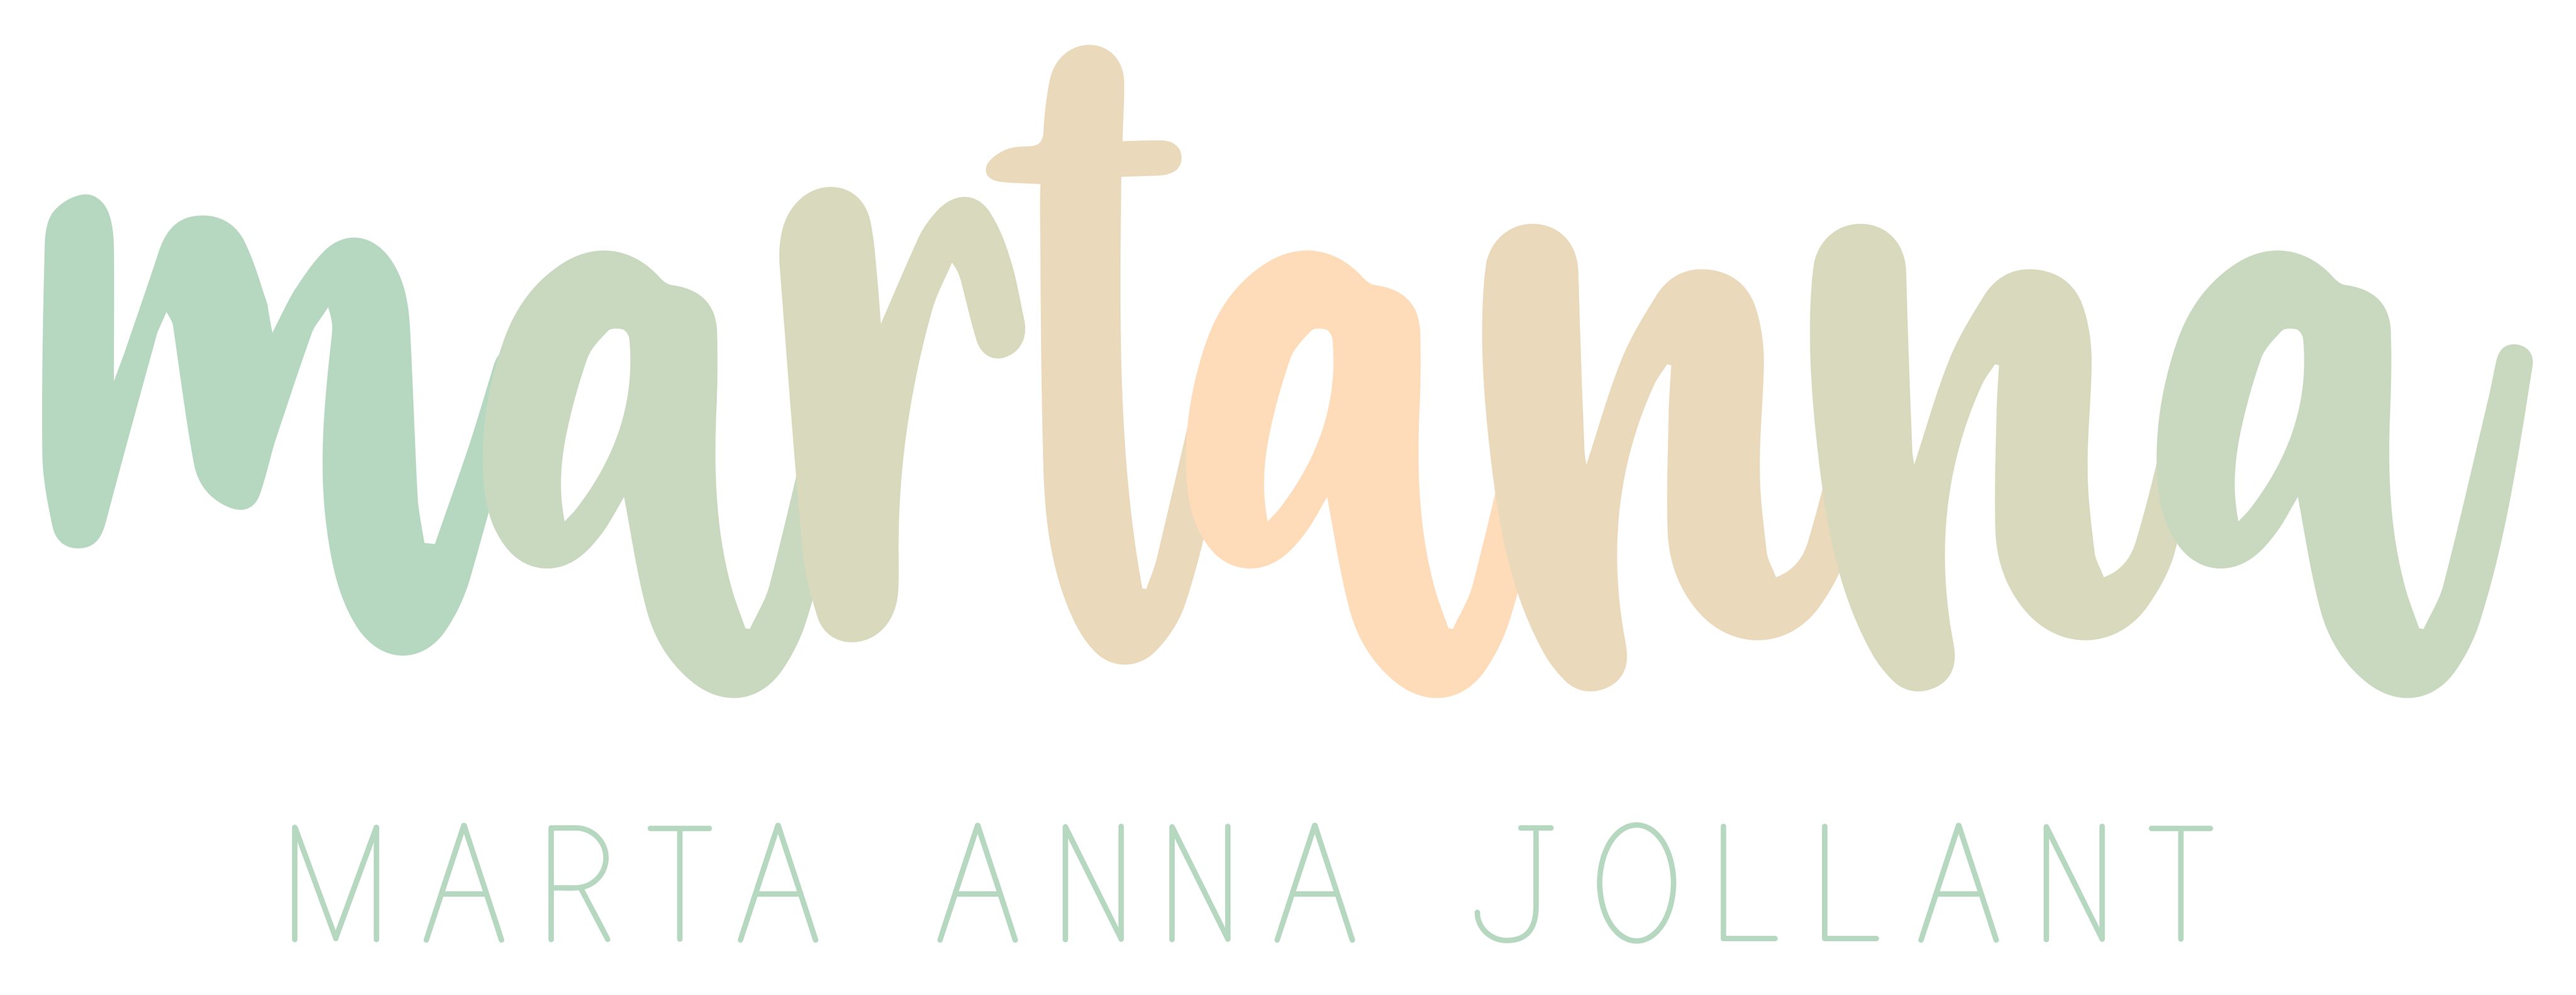 Portfolio of Marta Anna Jollant